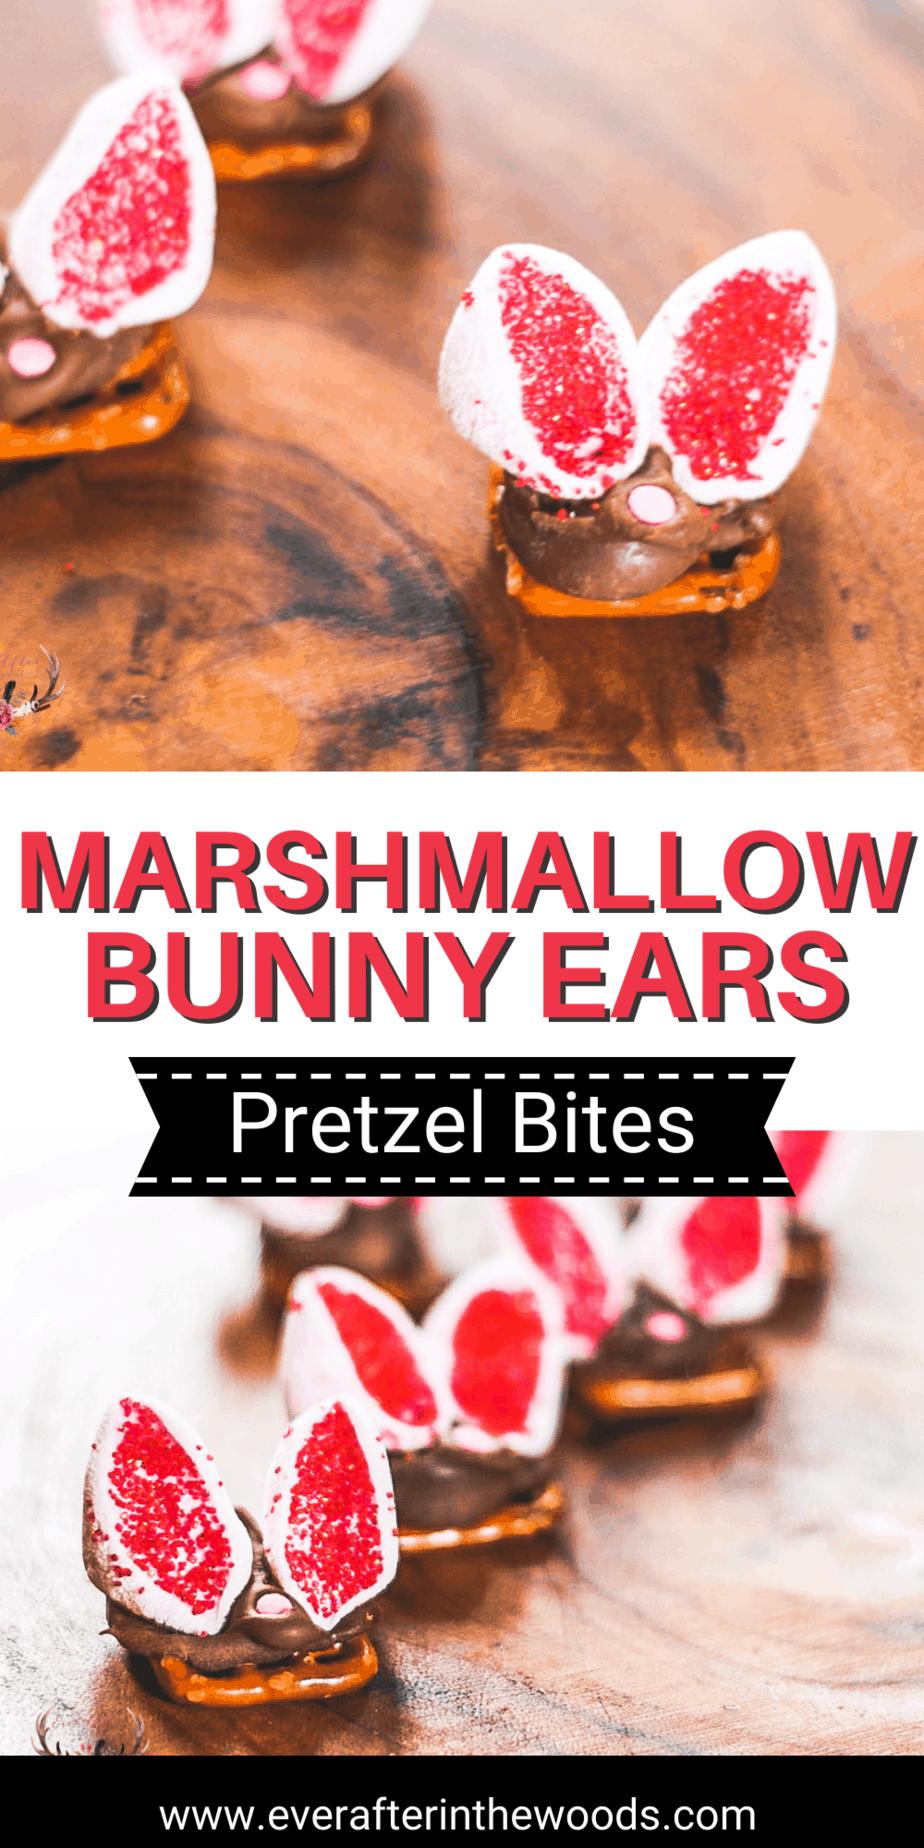 Bunny Chocolate Pretzel Bites